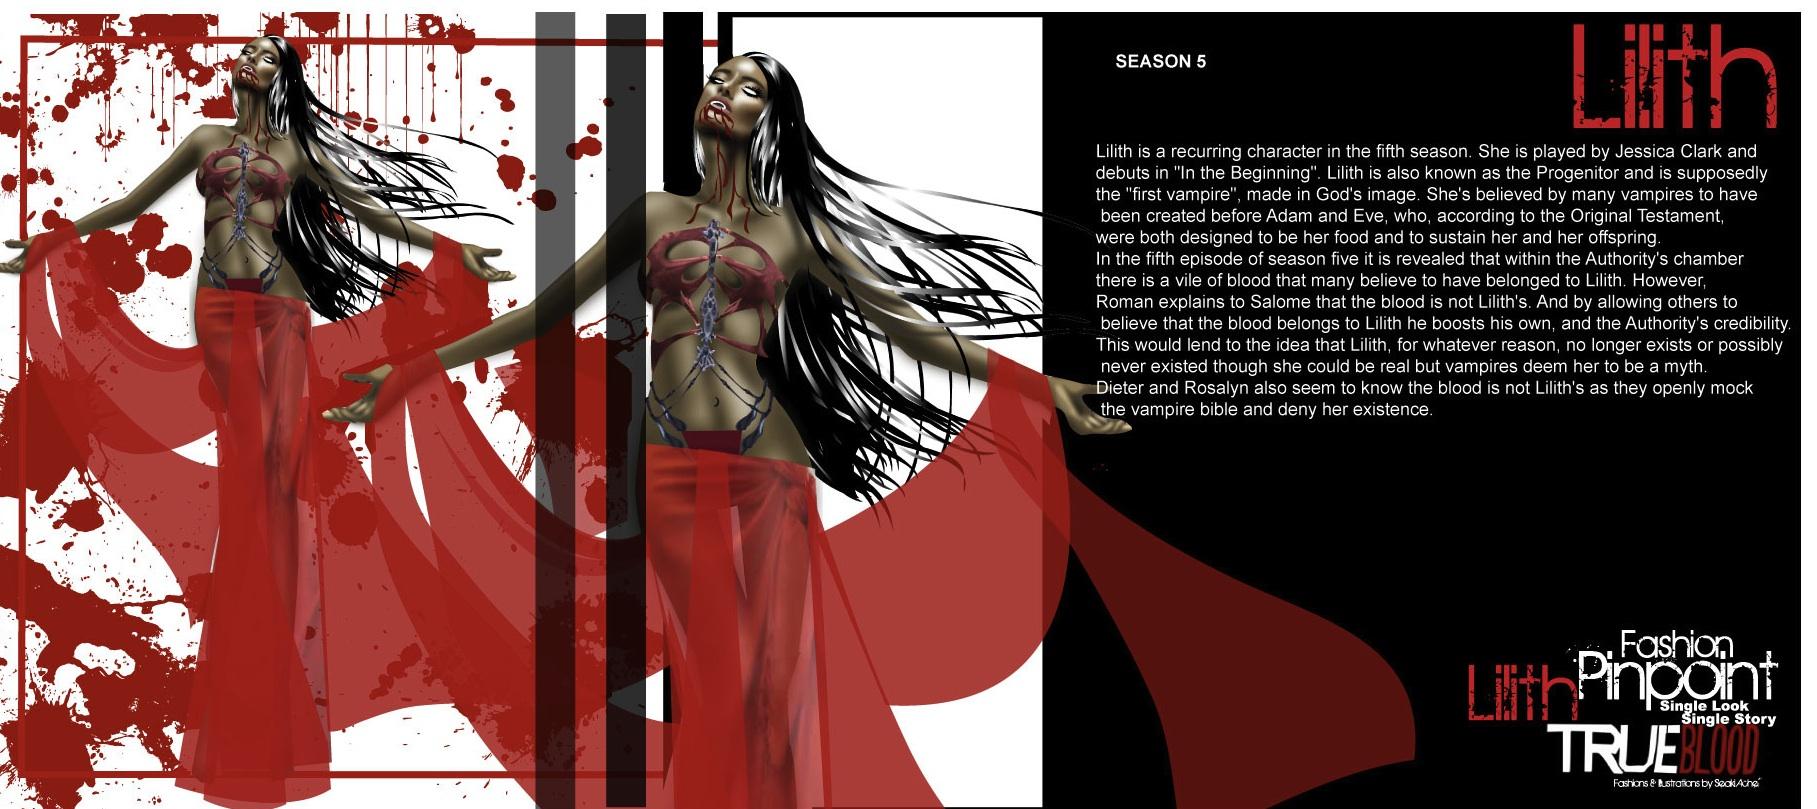 True blood 5 season fashion nervana for Maitresse lilith